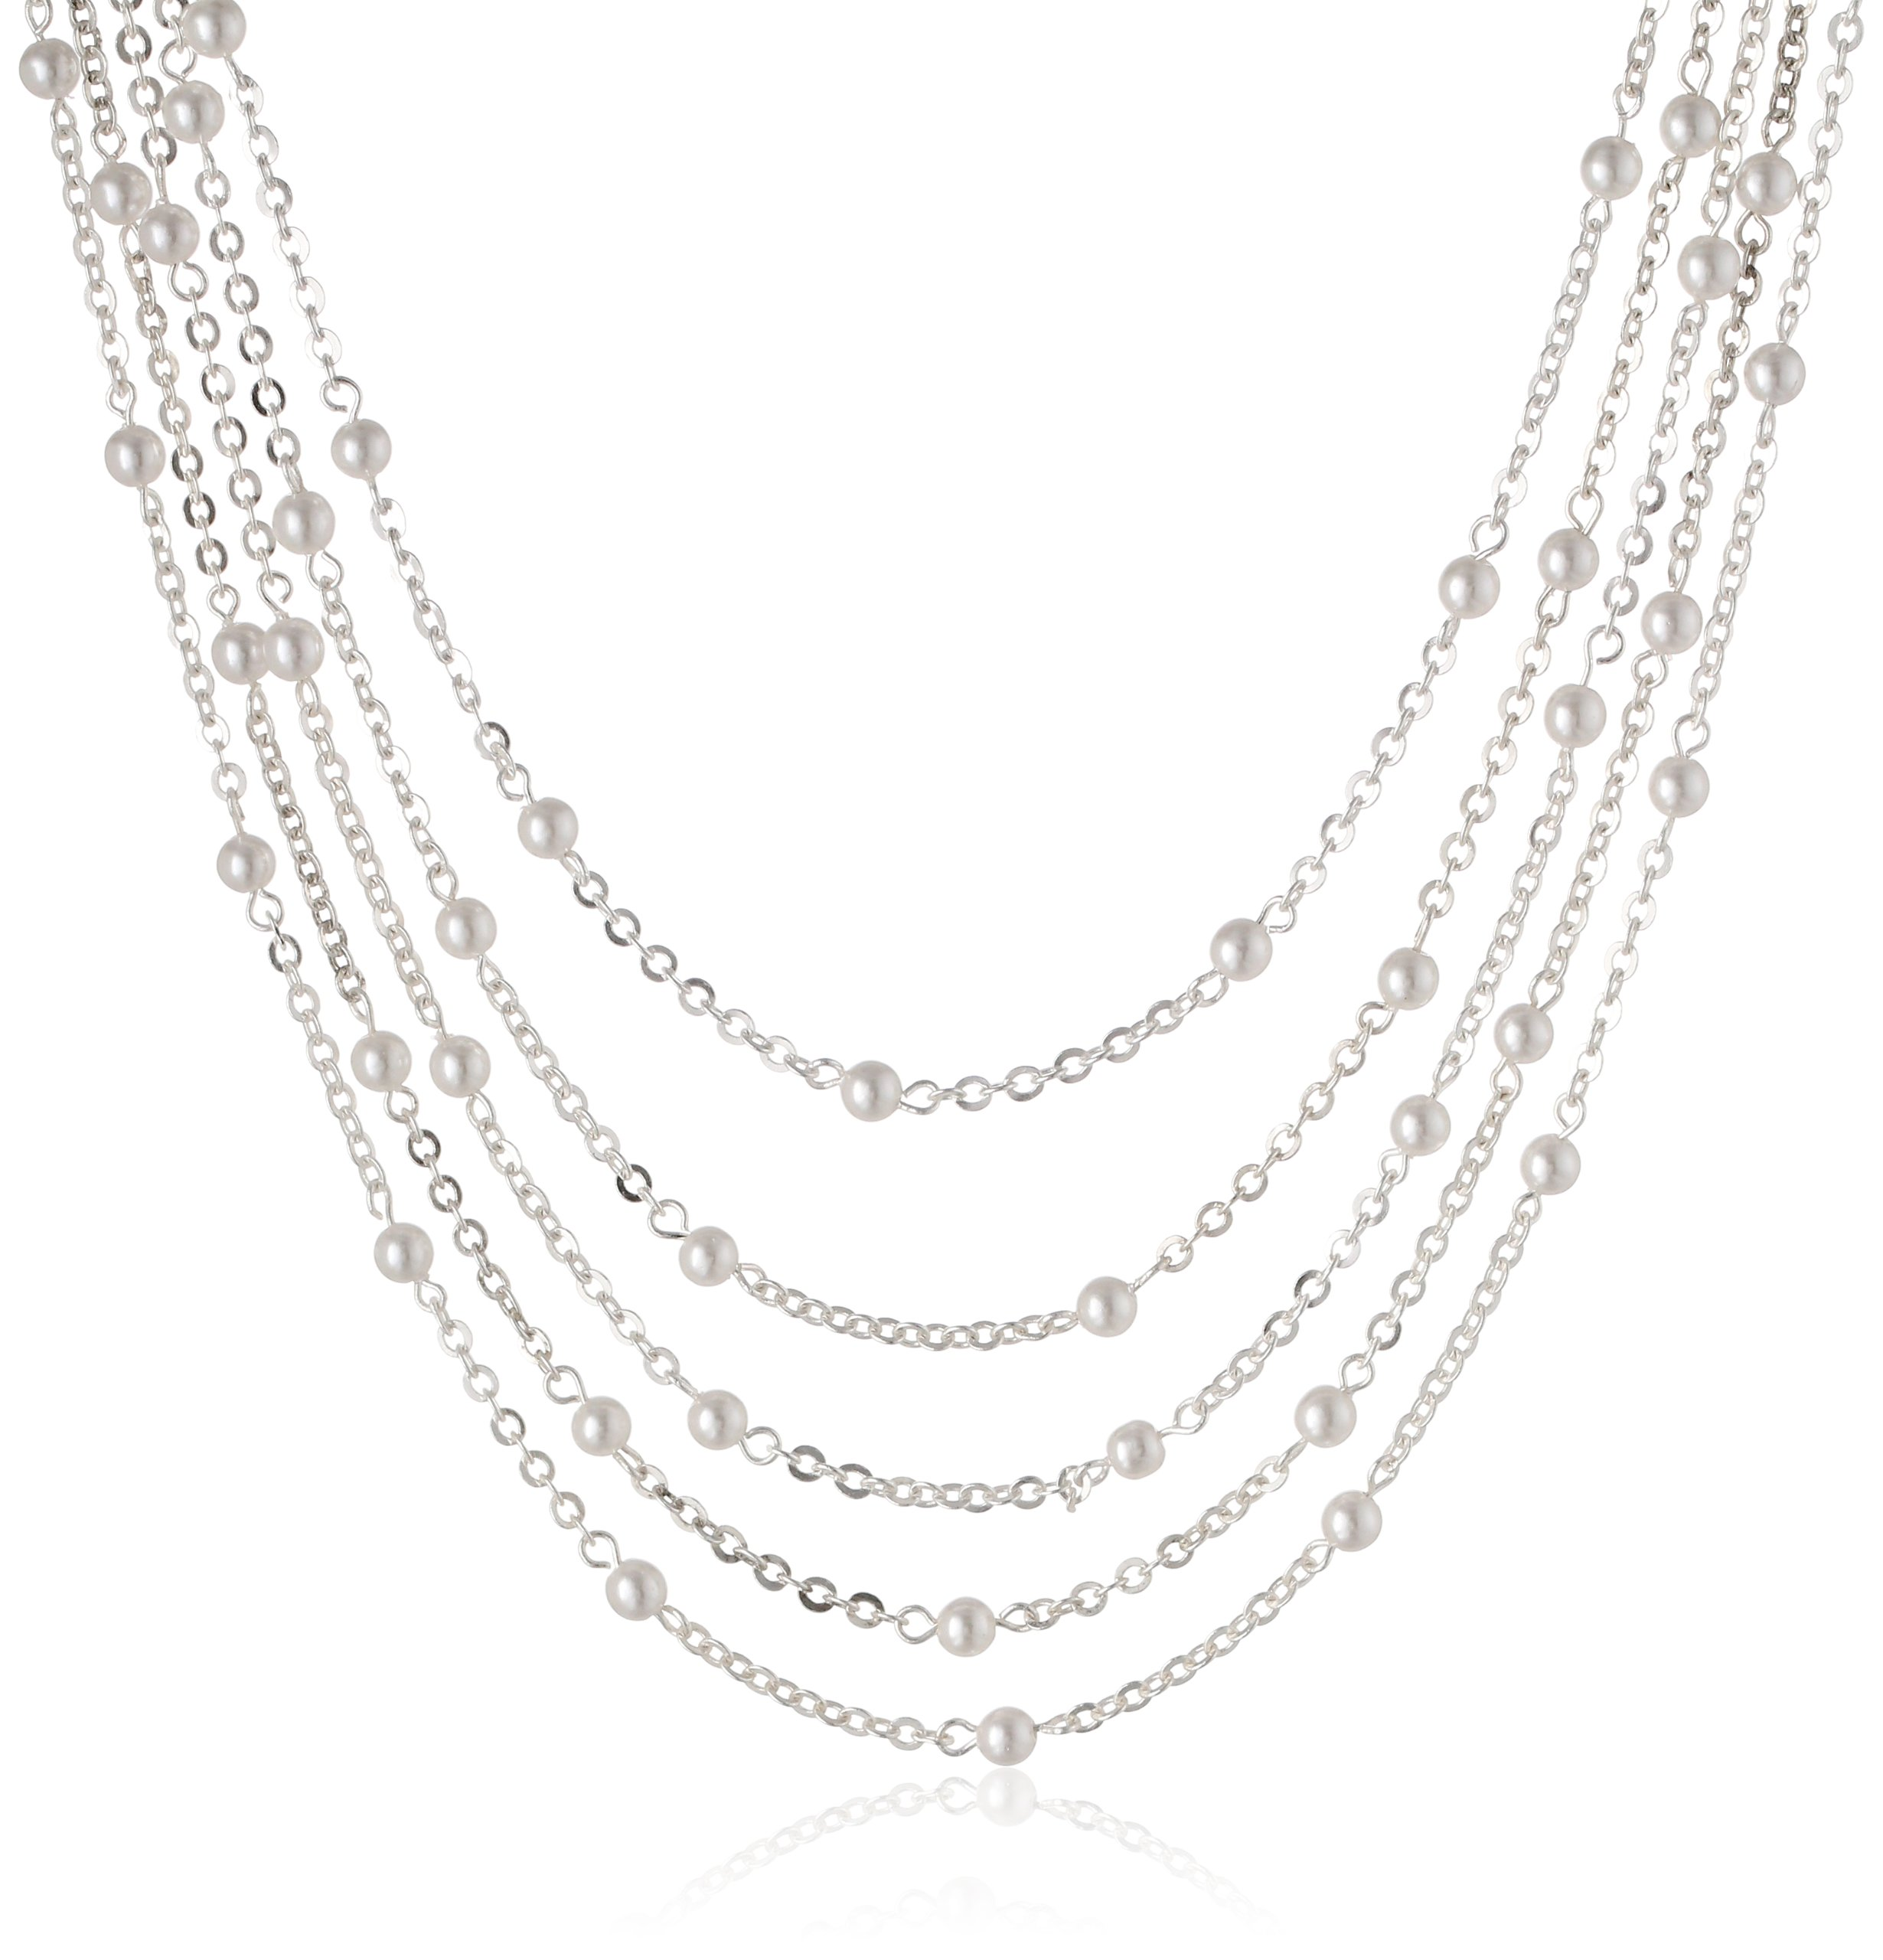 Signature 1928 Silver-Tone Simulated Pearl 5-Strand Necklace, 16''